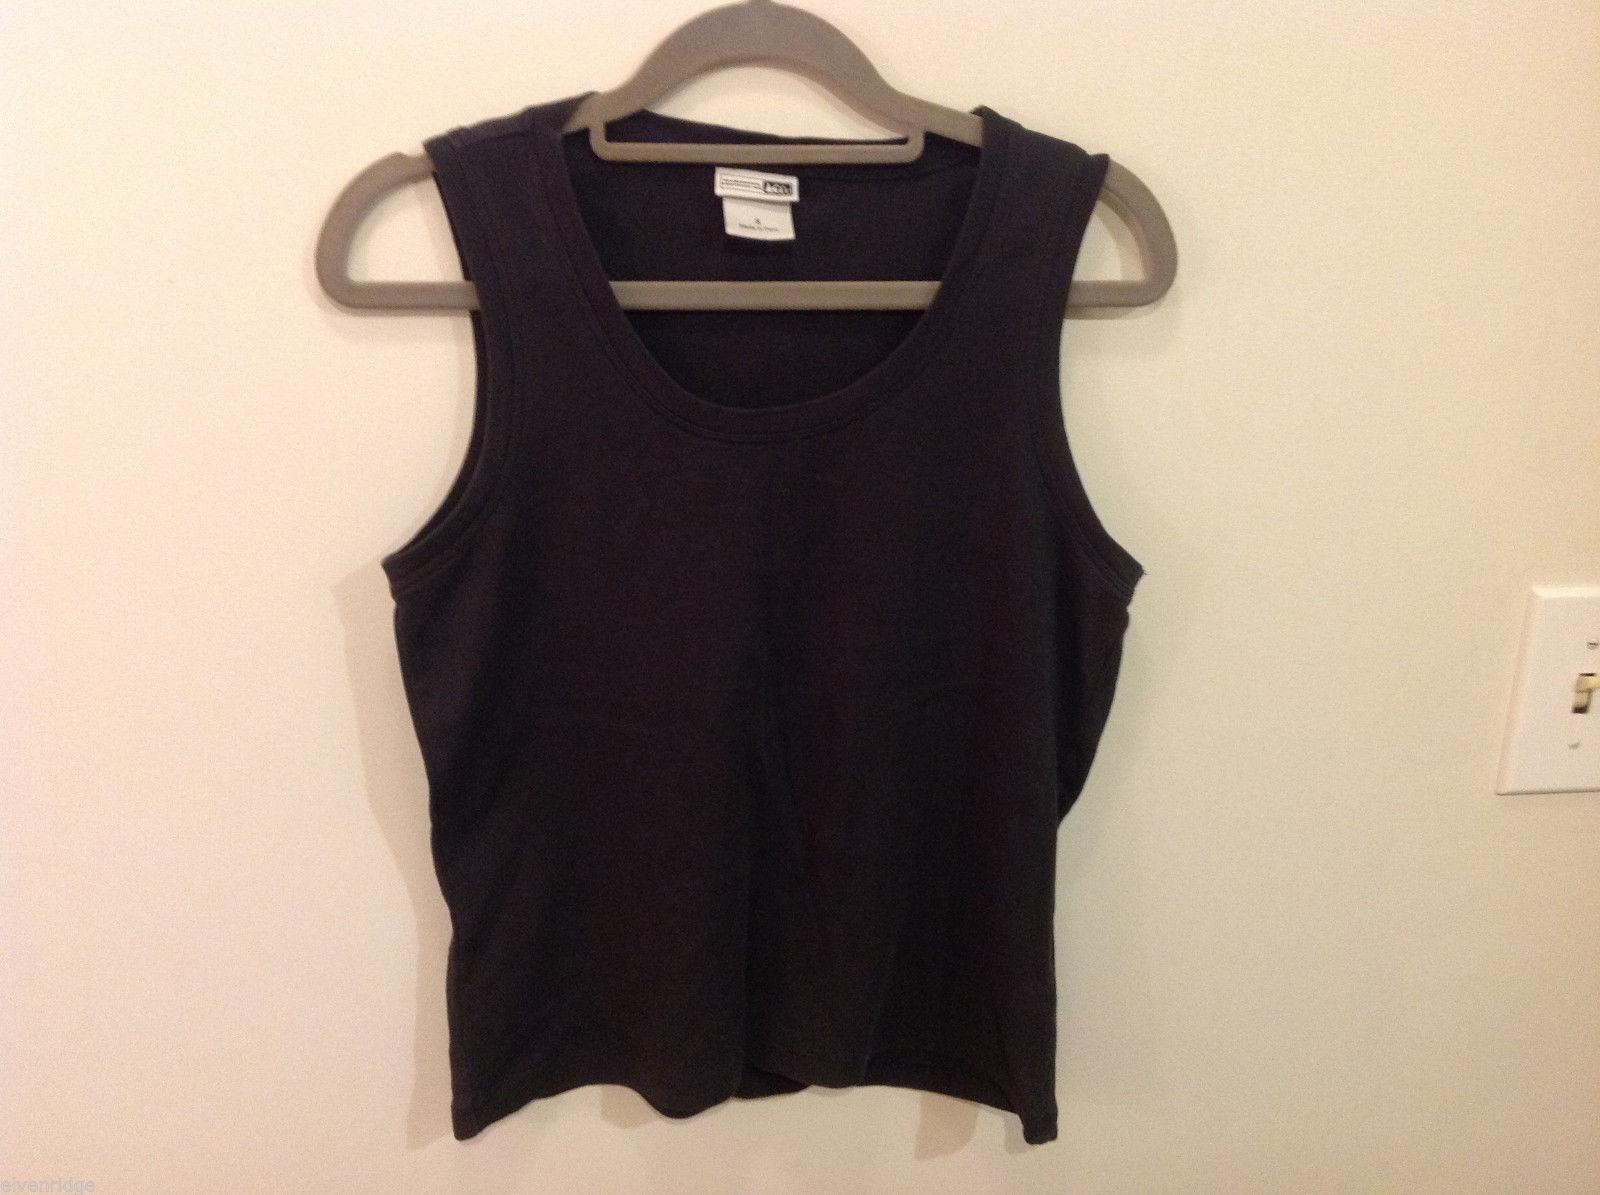 REI Womens Sleeveless Black Stretchable Cotton Tank Top Blouse, Size S